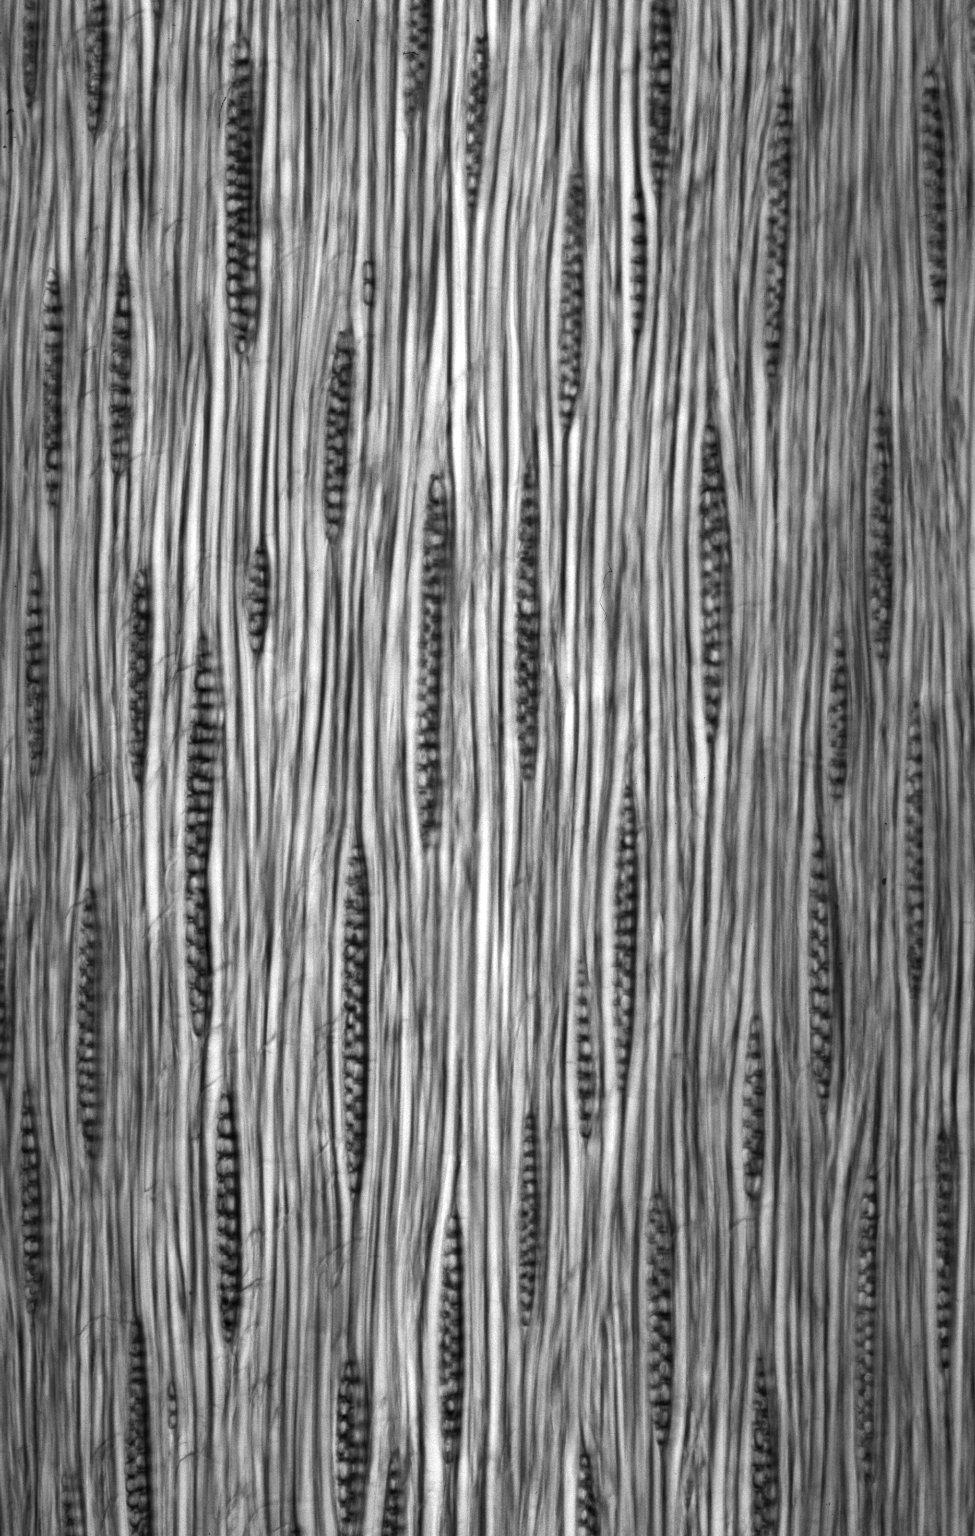 LEGUMINOSAE CAESALPINIOIDEAE Mimosoid Clade Newtonia leucocarpa